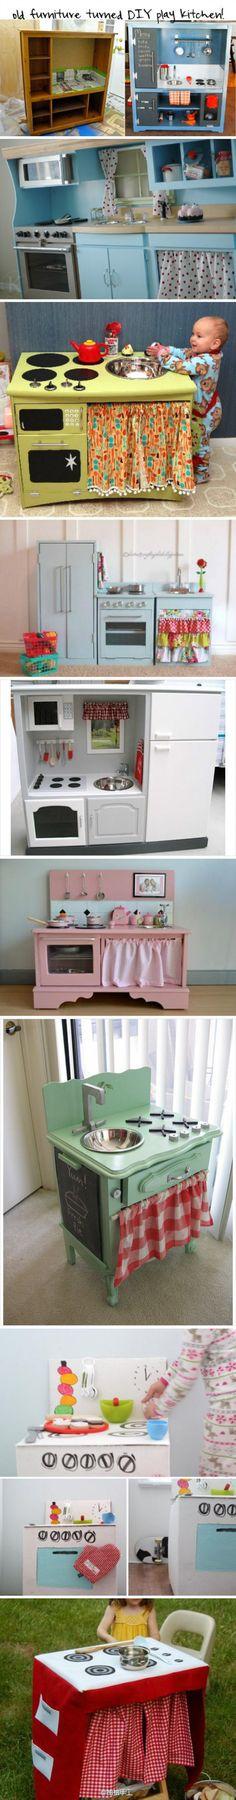 allerlei leuke dingen om te maken | Te gekke DIY keukentjes!! Door moooooi